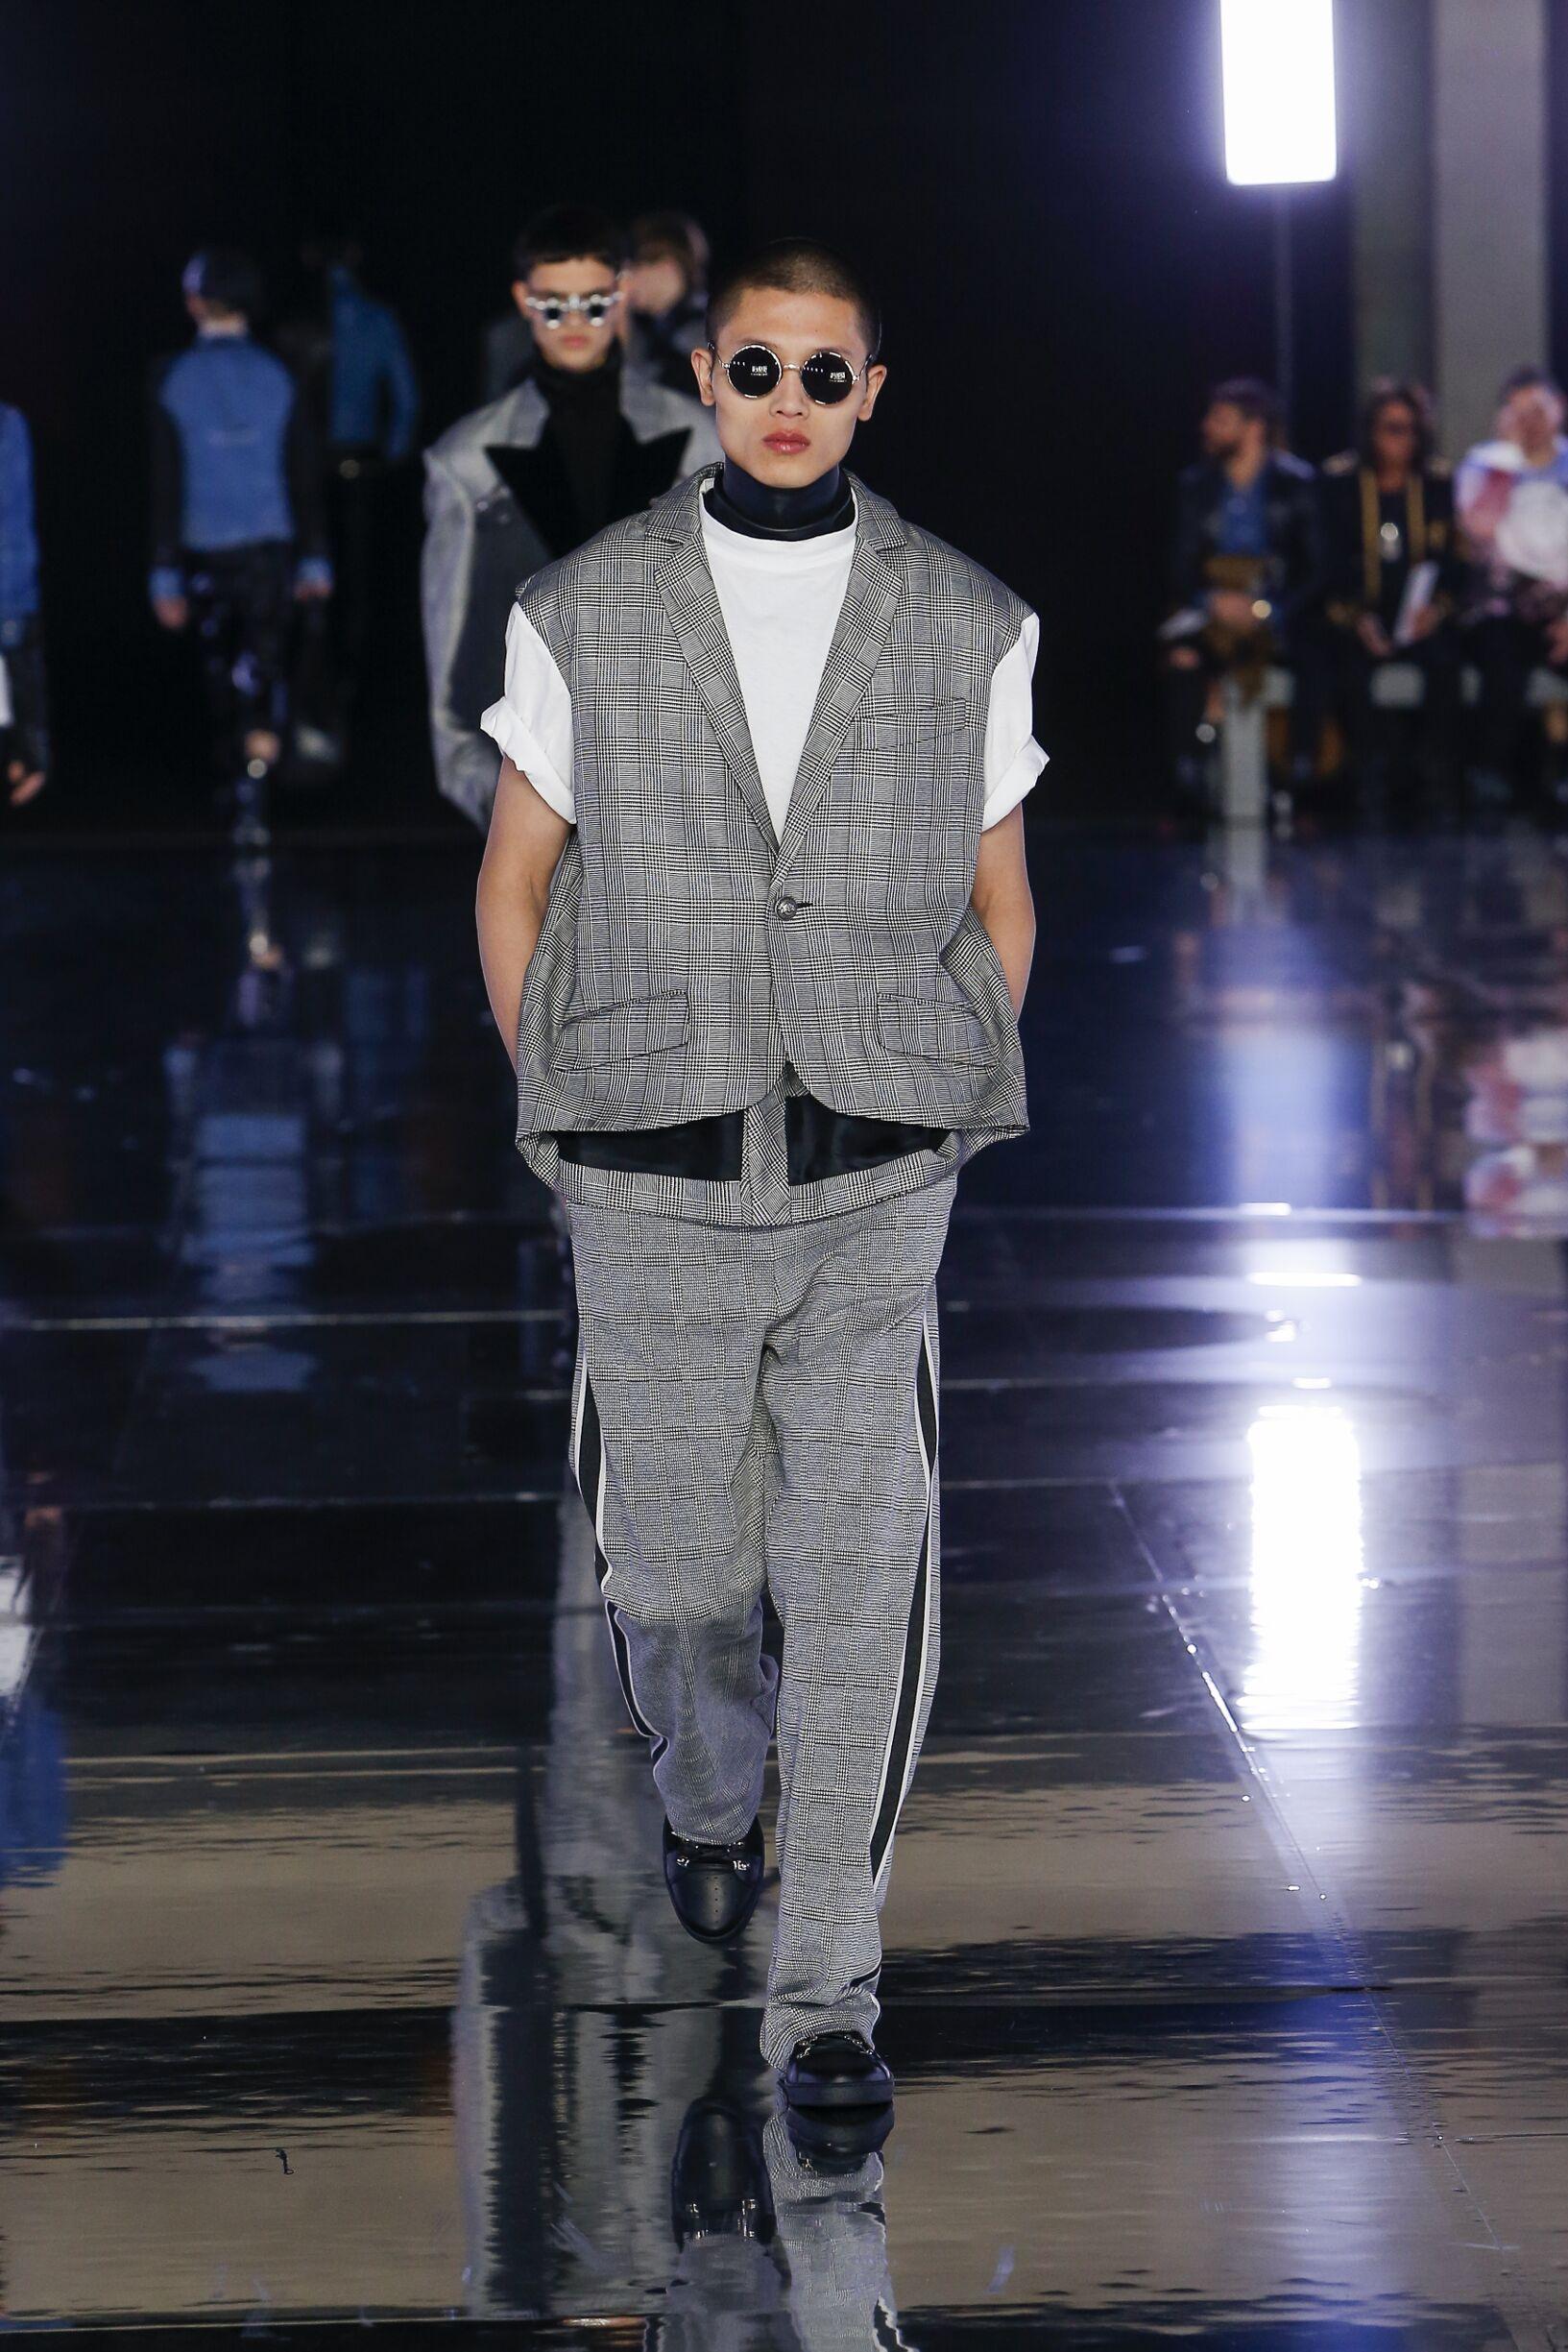 FW 2019 Balmain Show Paris Fashion Week Menswear